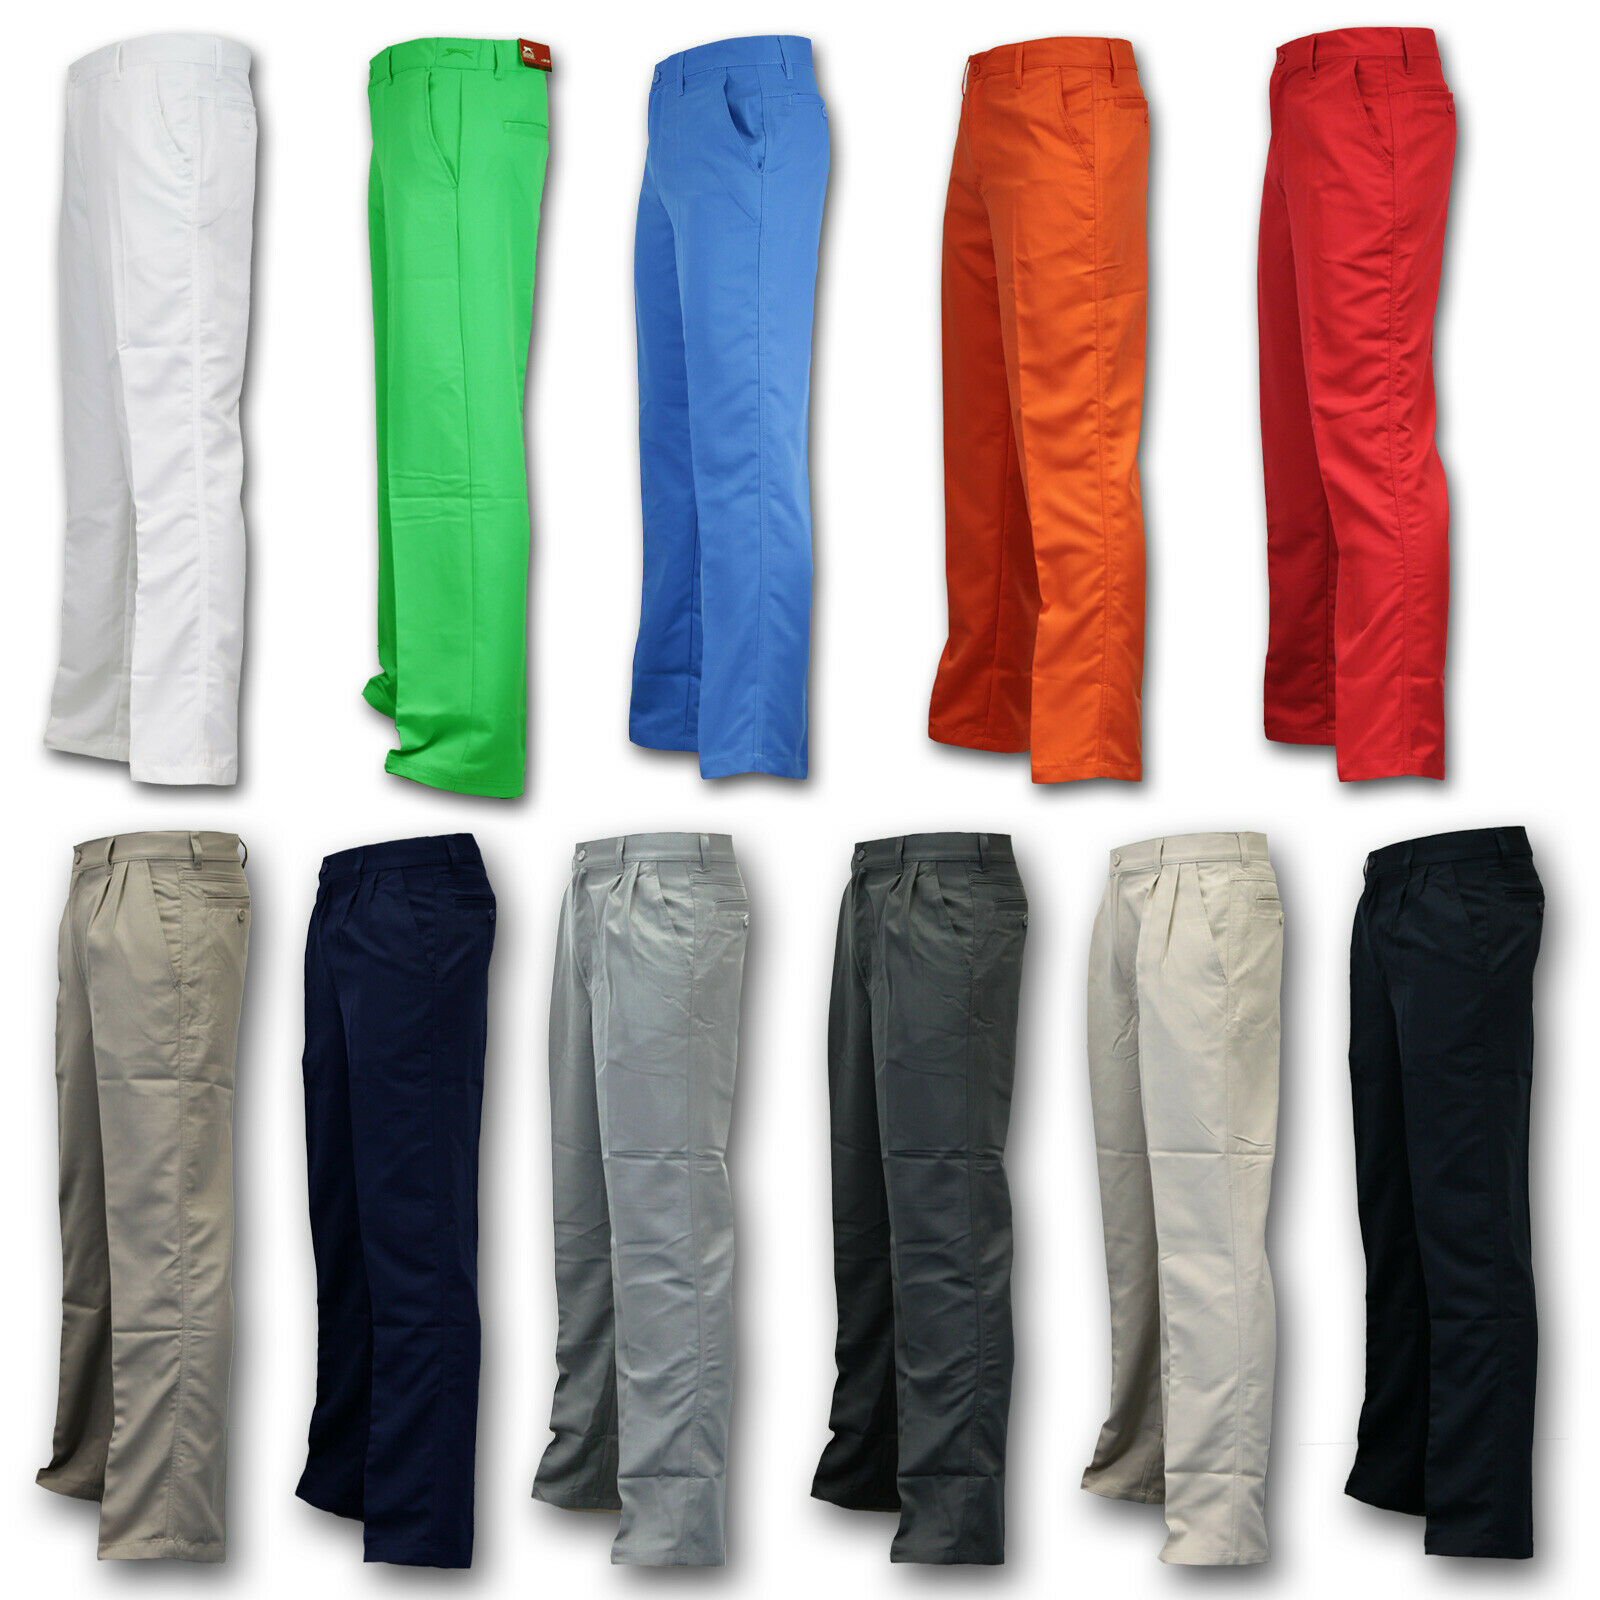 DUNLOP SLAZENGER Golfhose Pants Herren Blau,Sand,Grau,Schwarz 30W 29L - 50W 31L